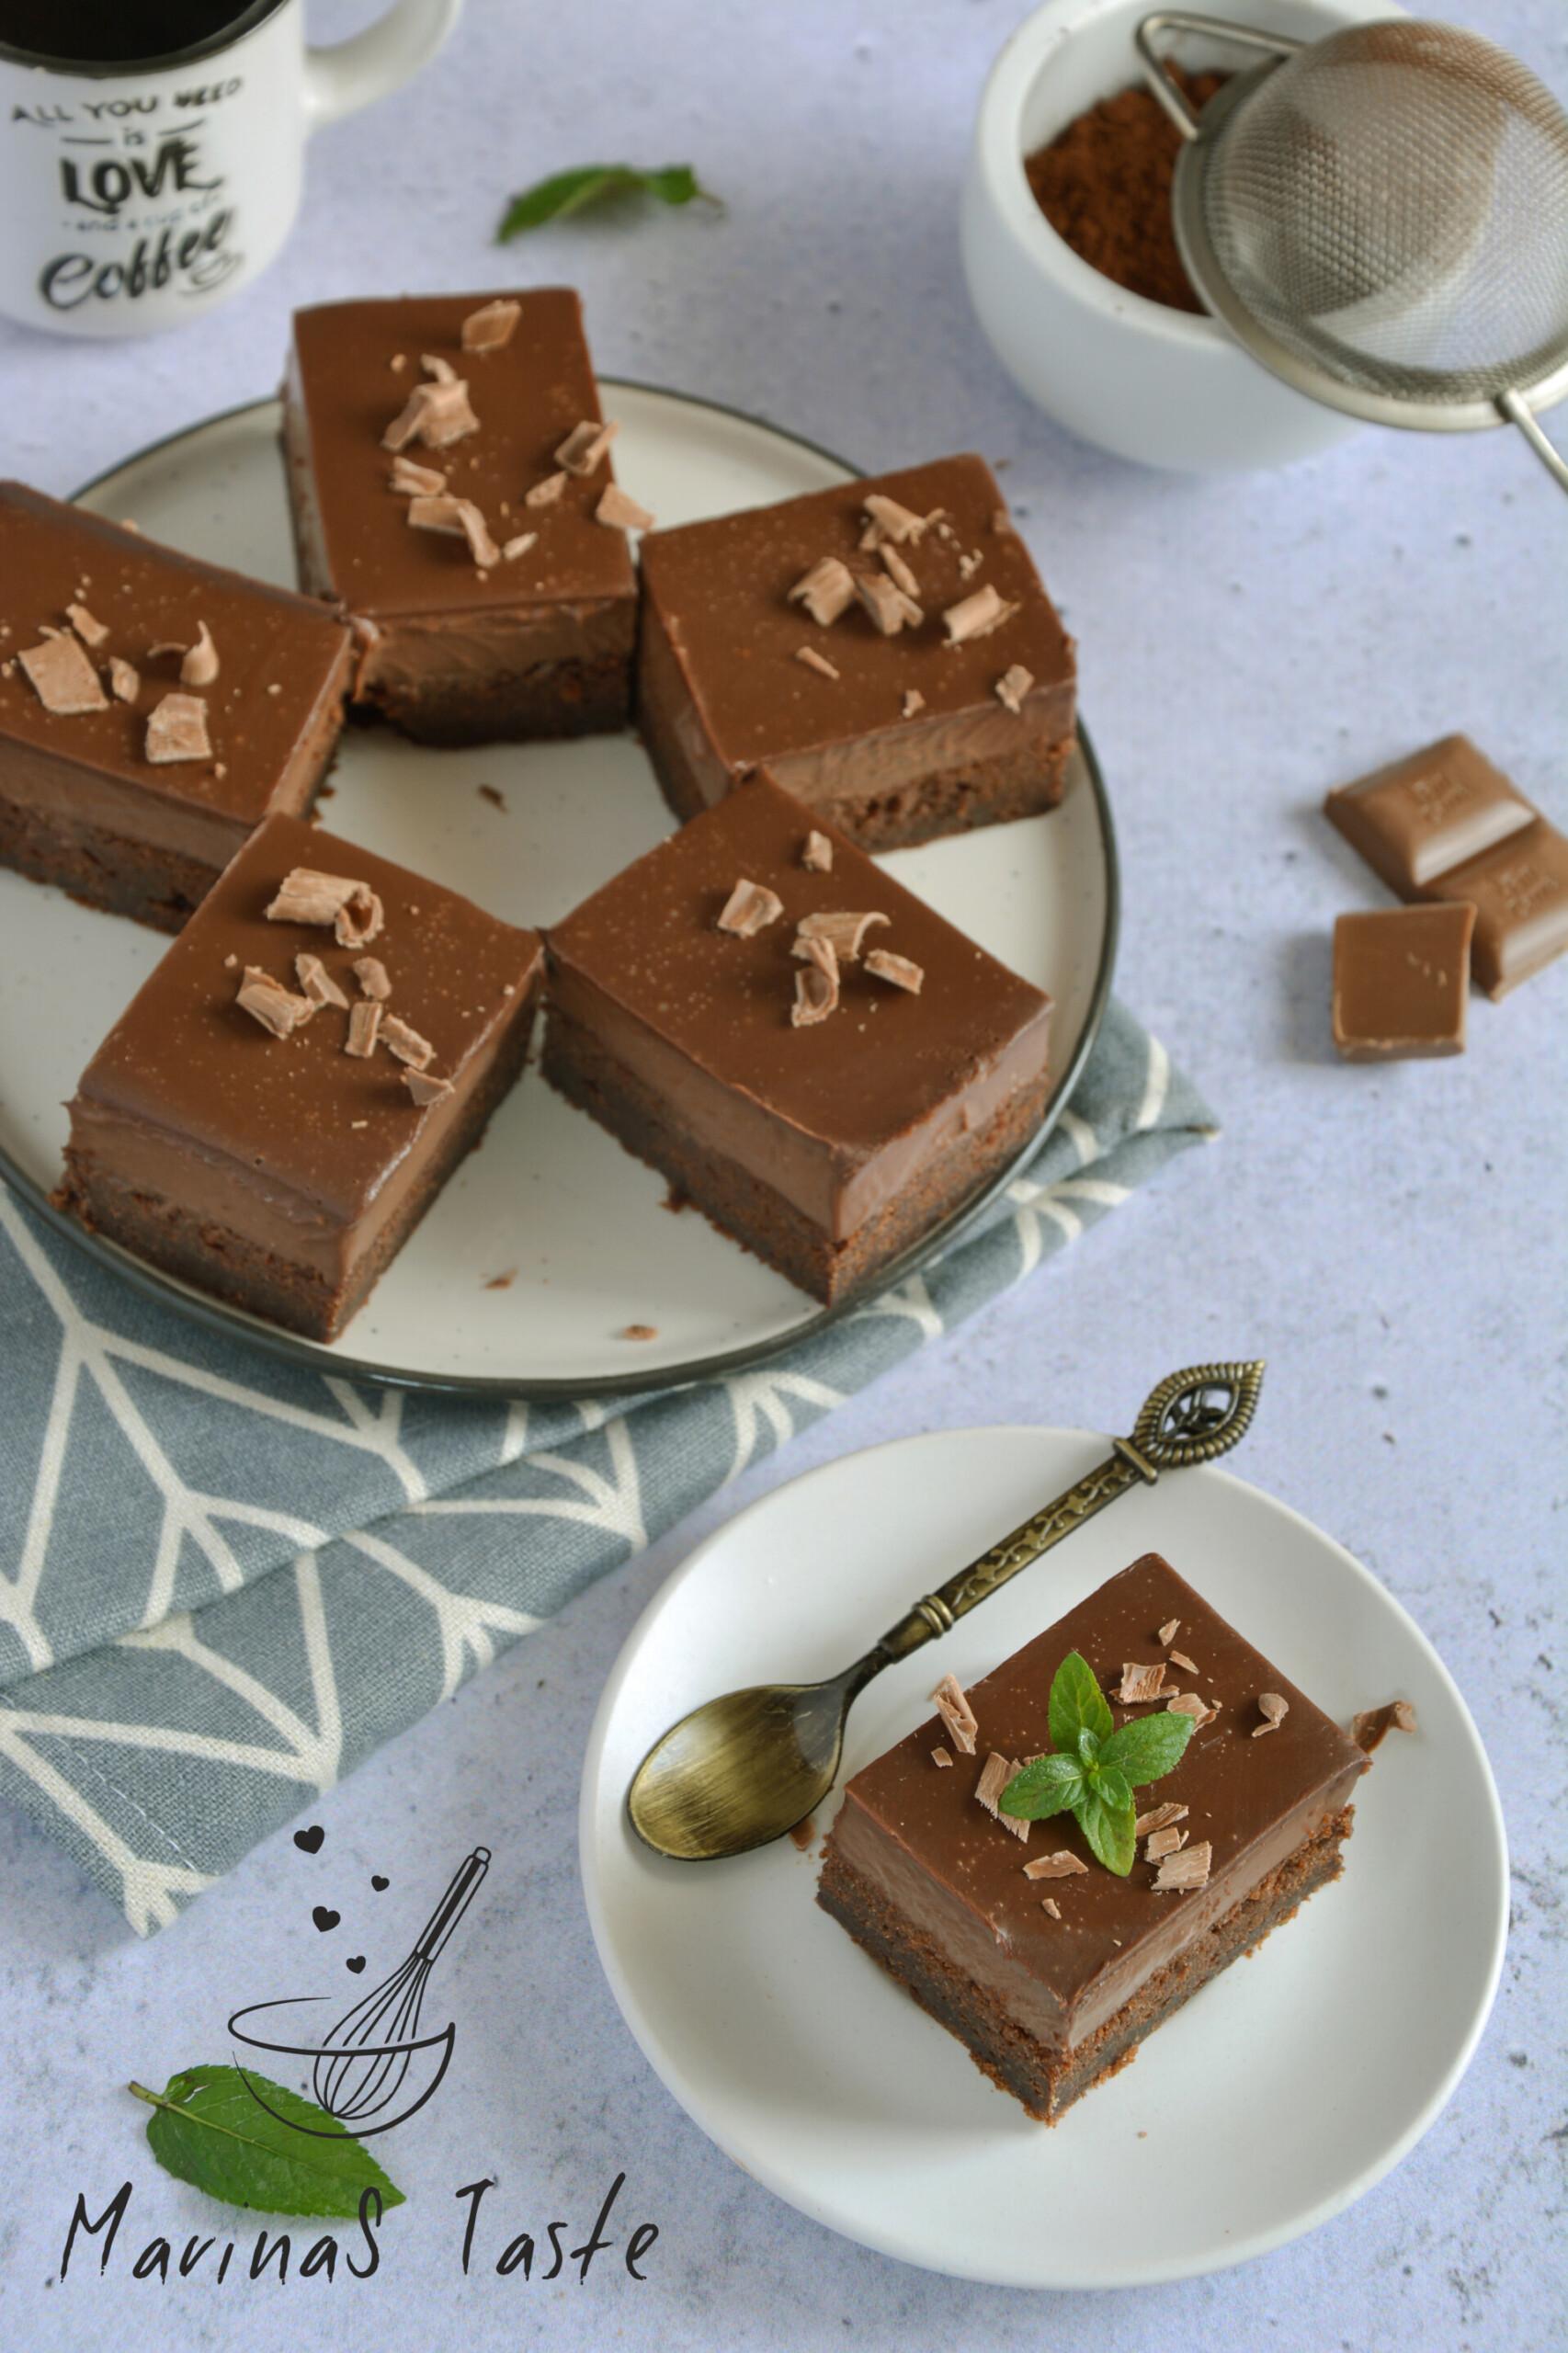 Becke-cokoladne-kocke-1a